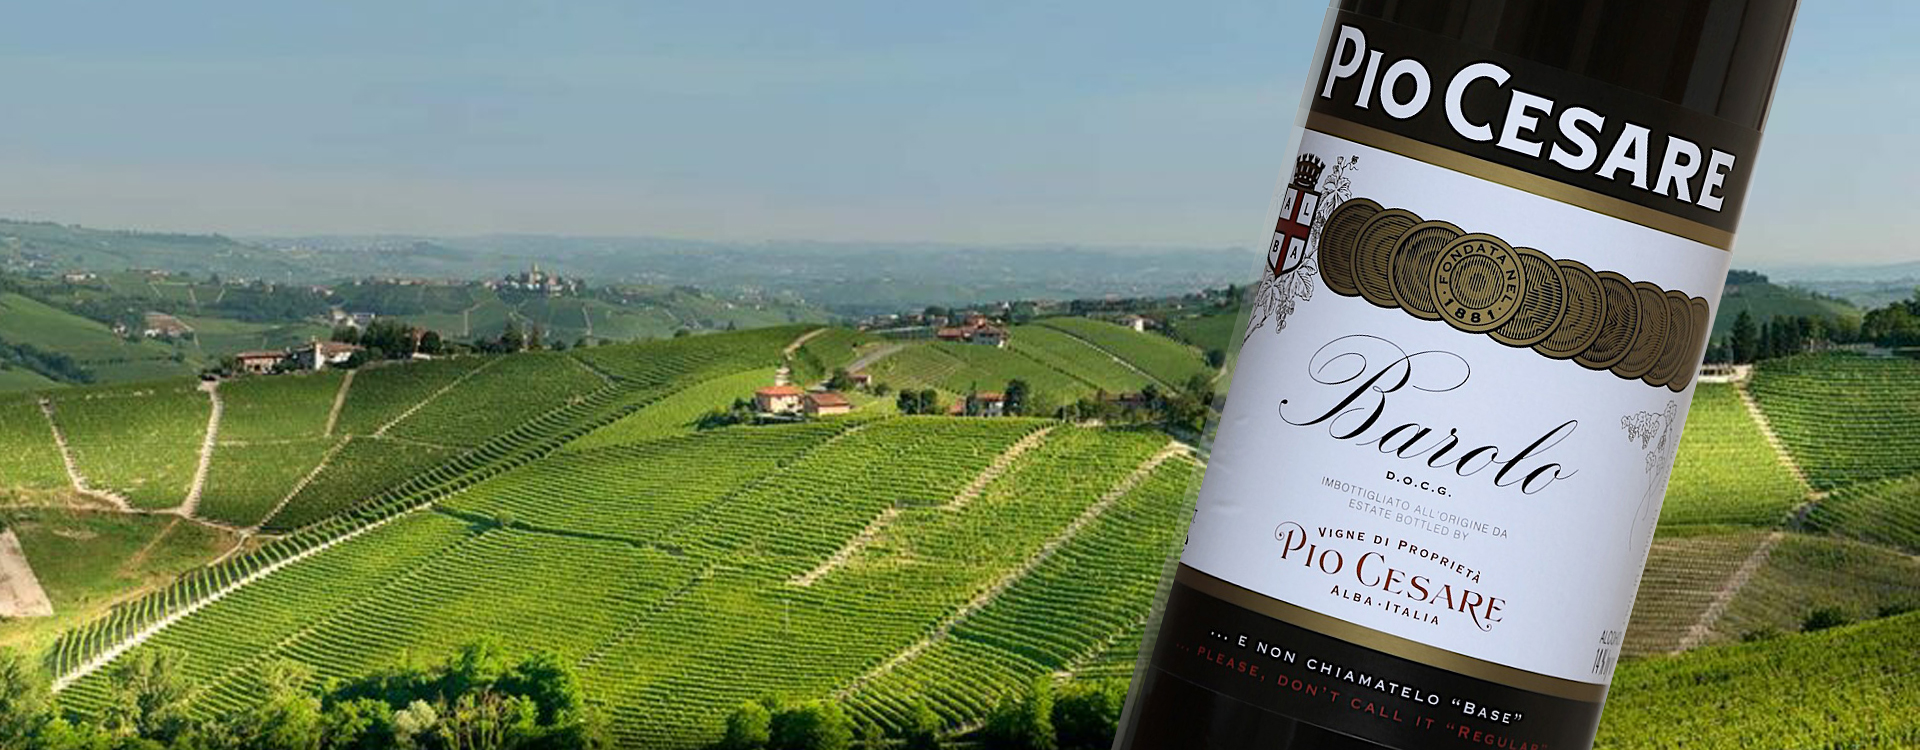 Pio Ceasre Wines